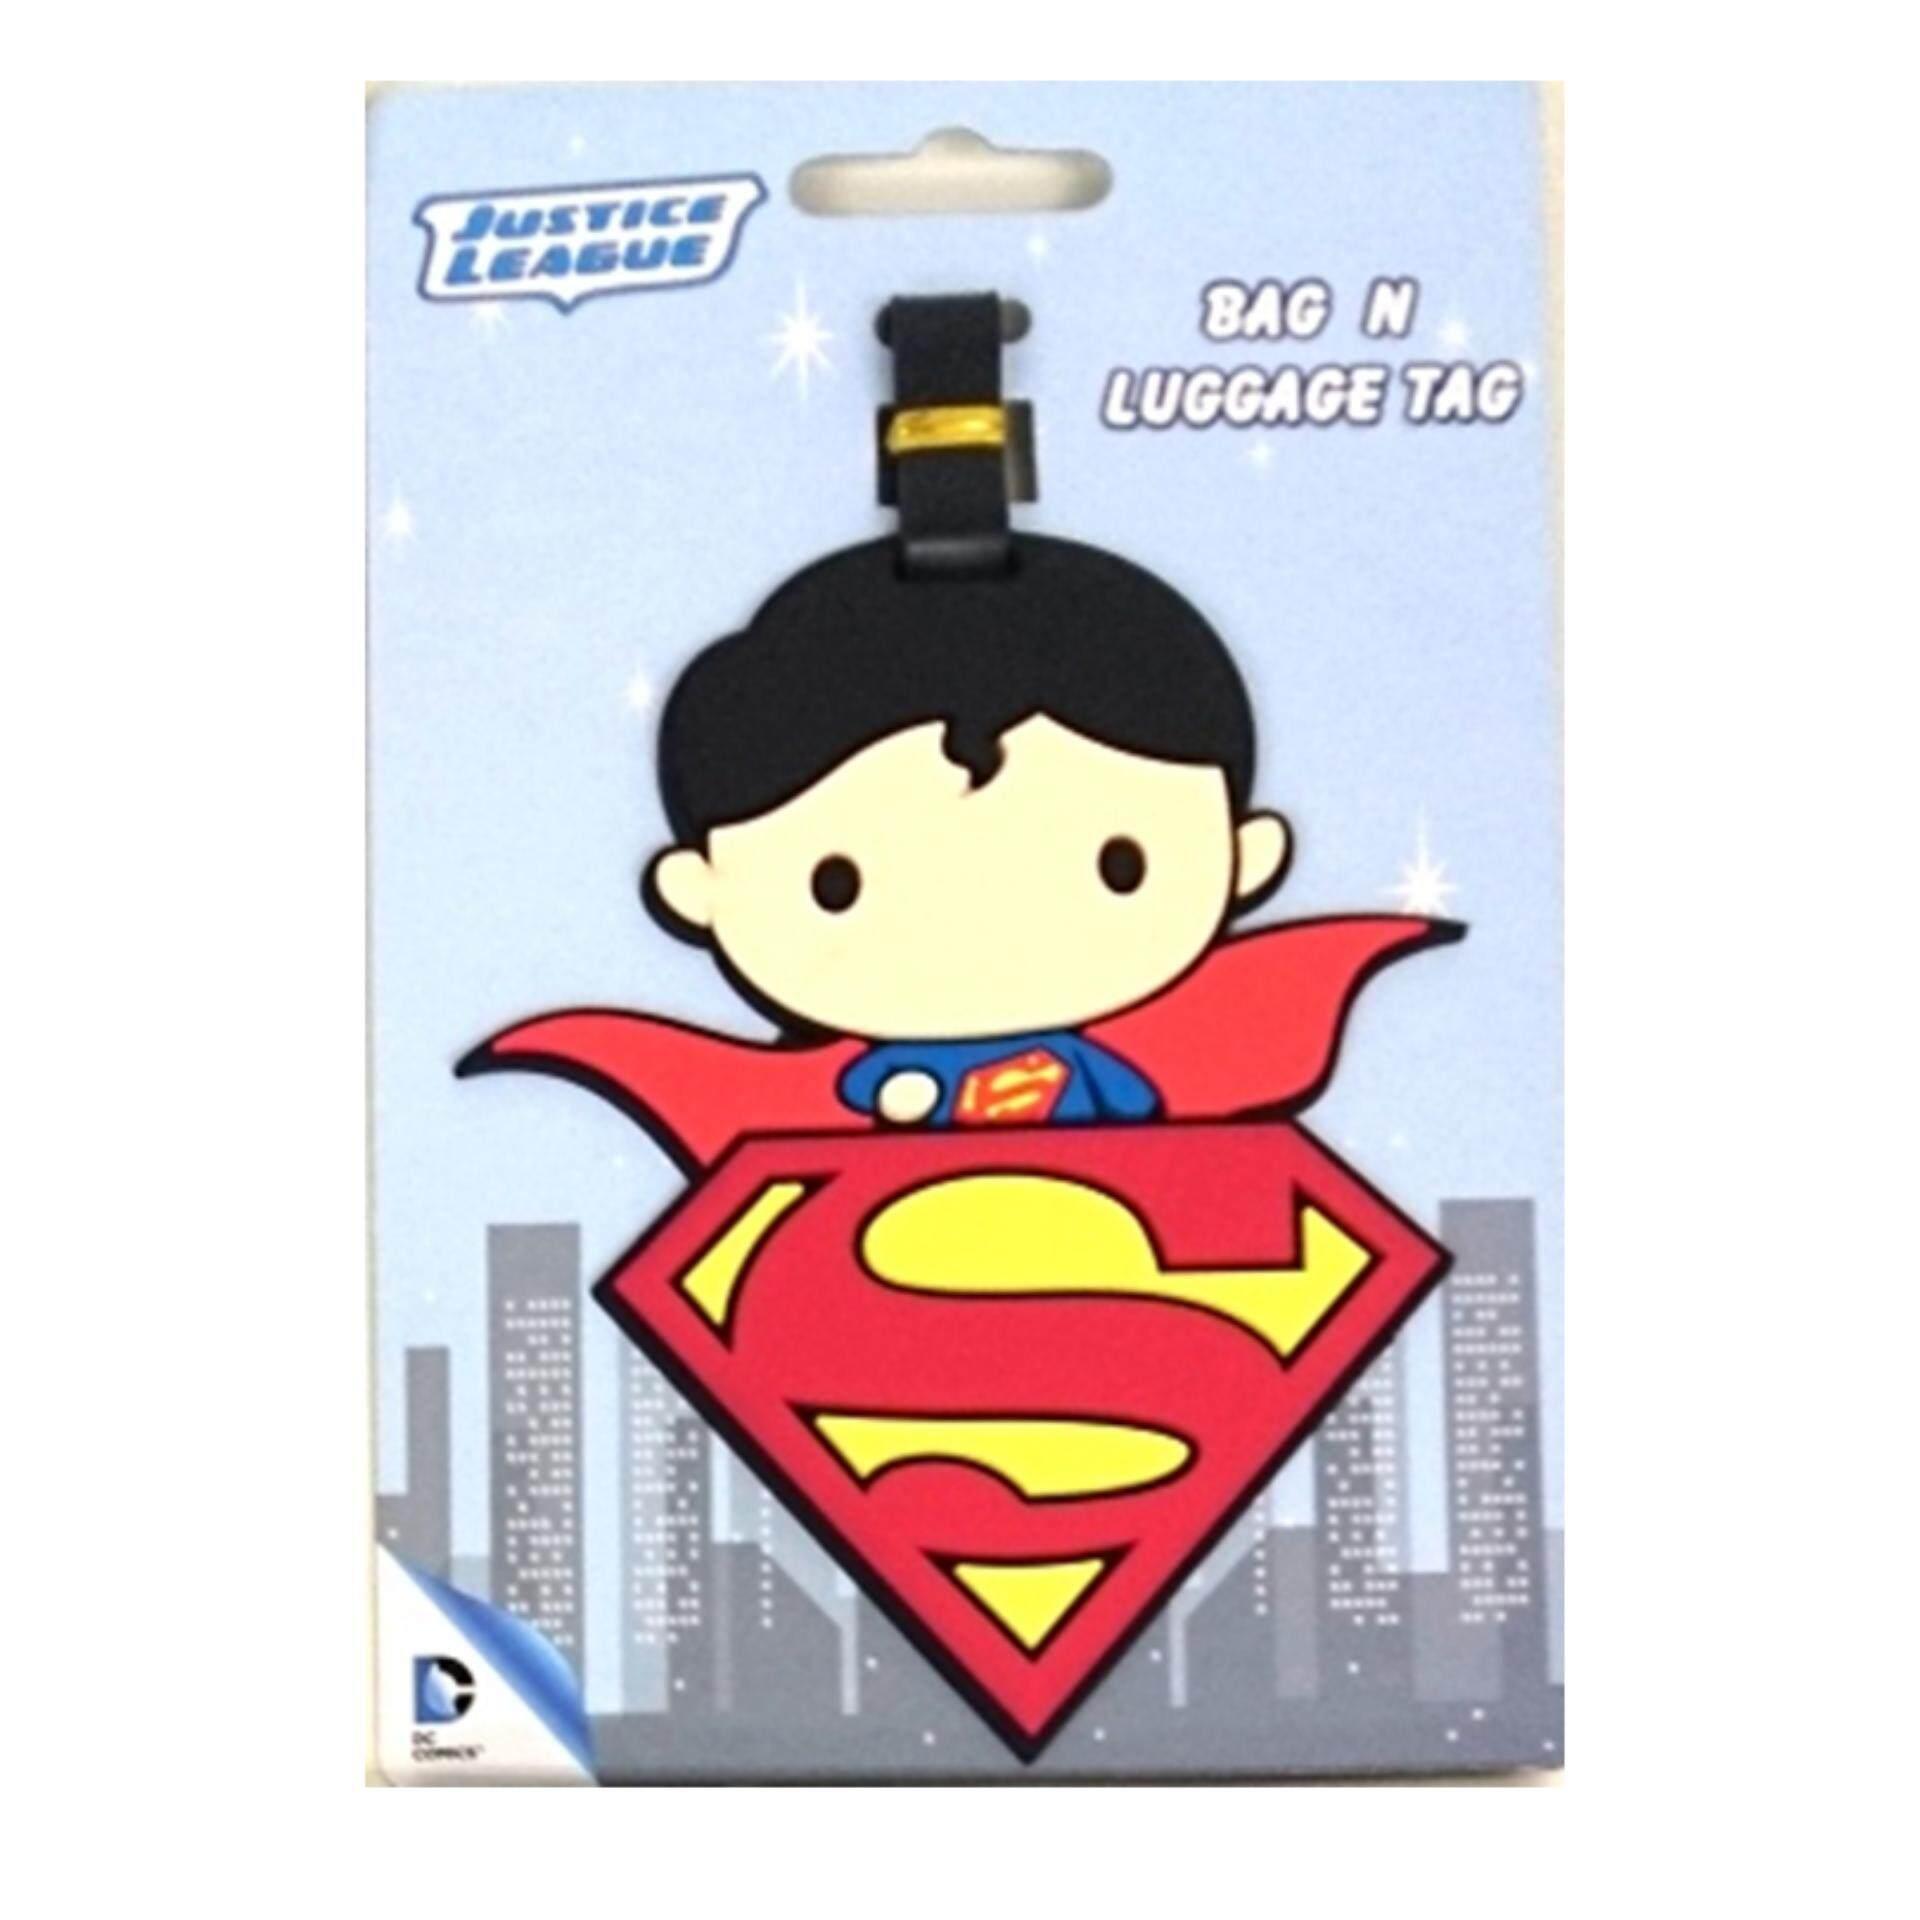 DC Comics Justice League Luggage Tag - Chibi Superman